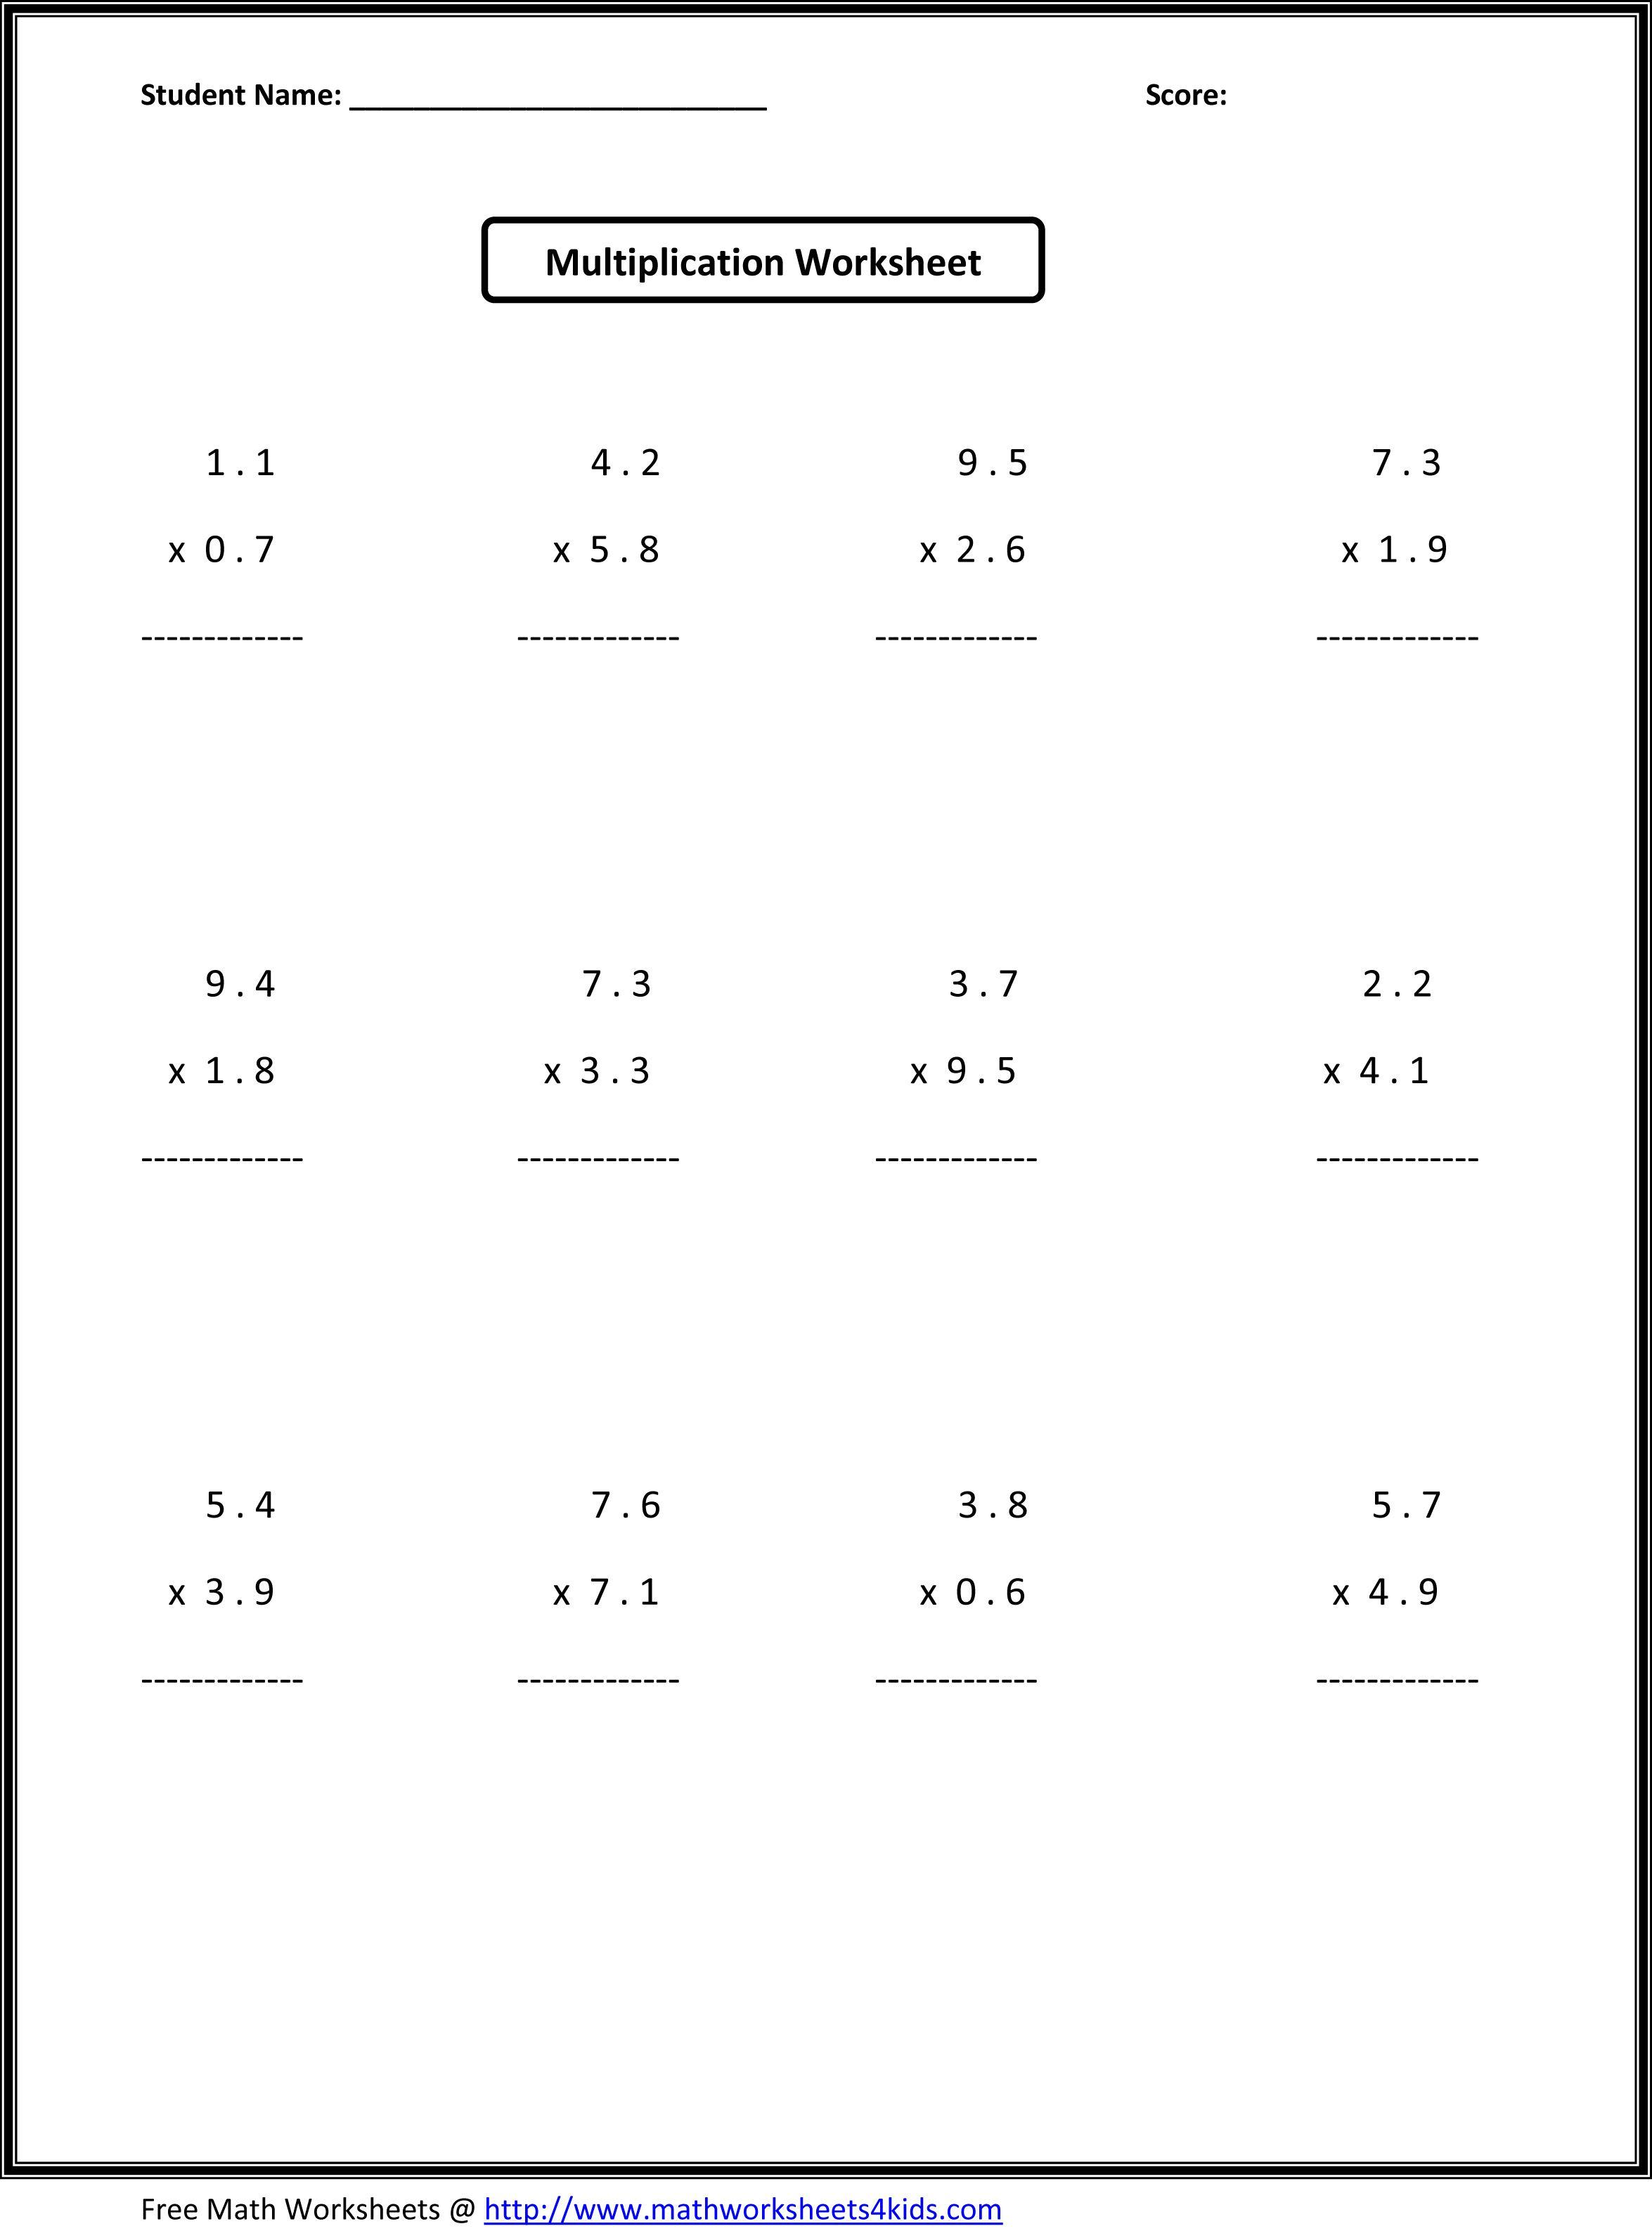 7Th Grade Math Worksheets | Value Worksheets Absolute Value - Free Printable Math Worksheets 6Th Grade Order Operations